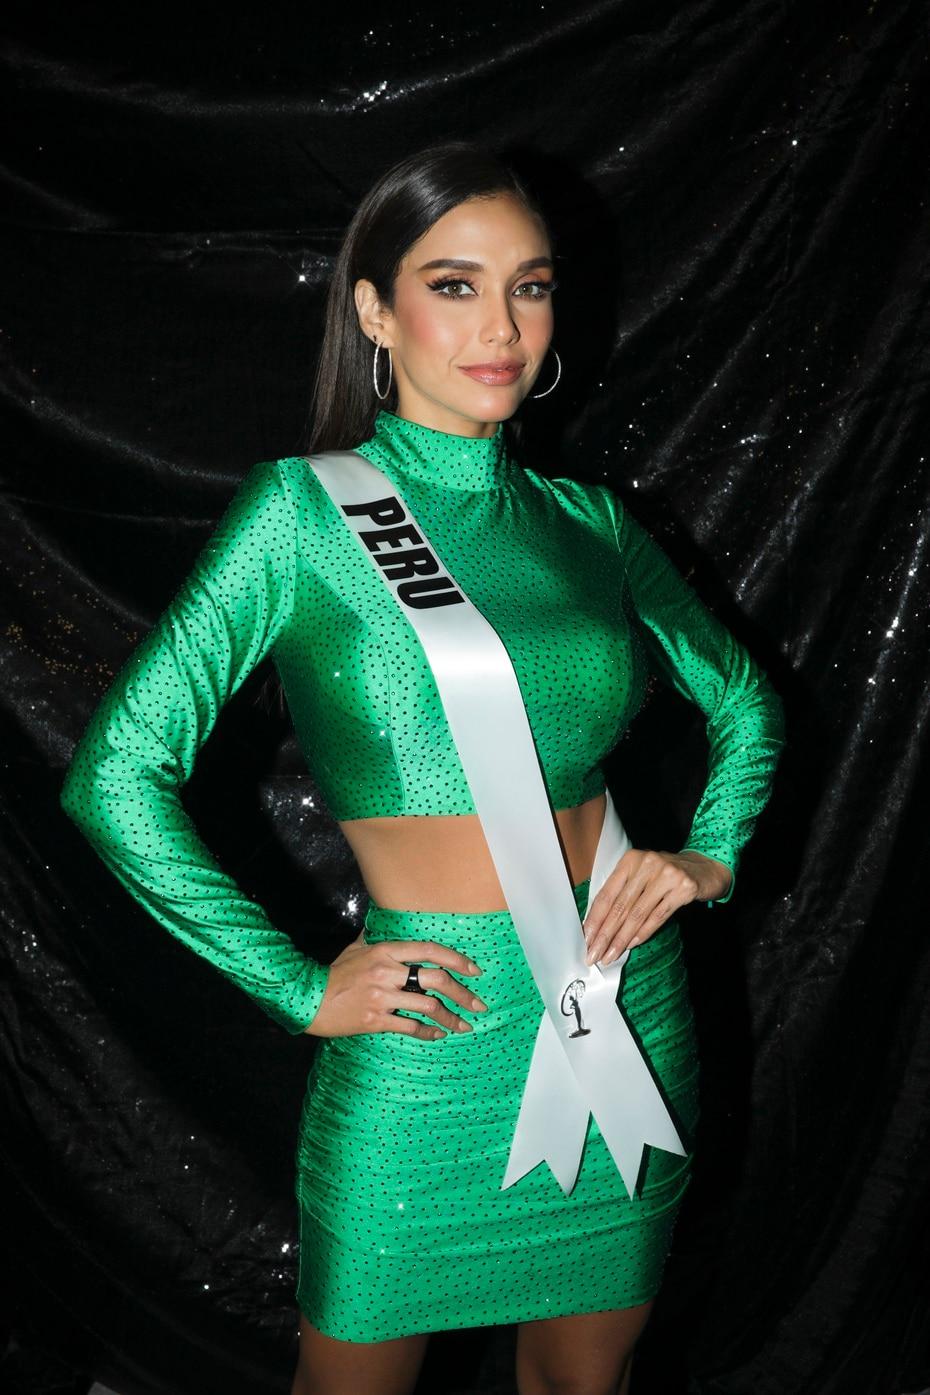 Miss Perú tras bastidores.